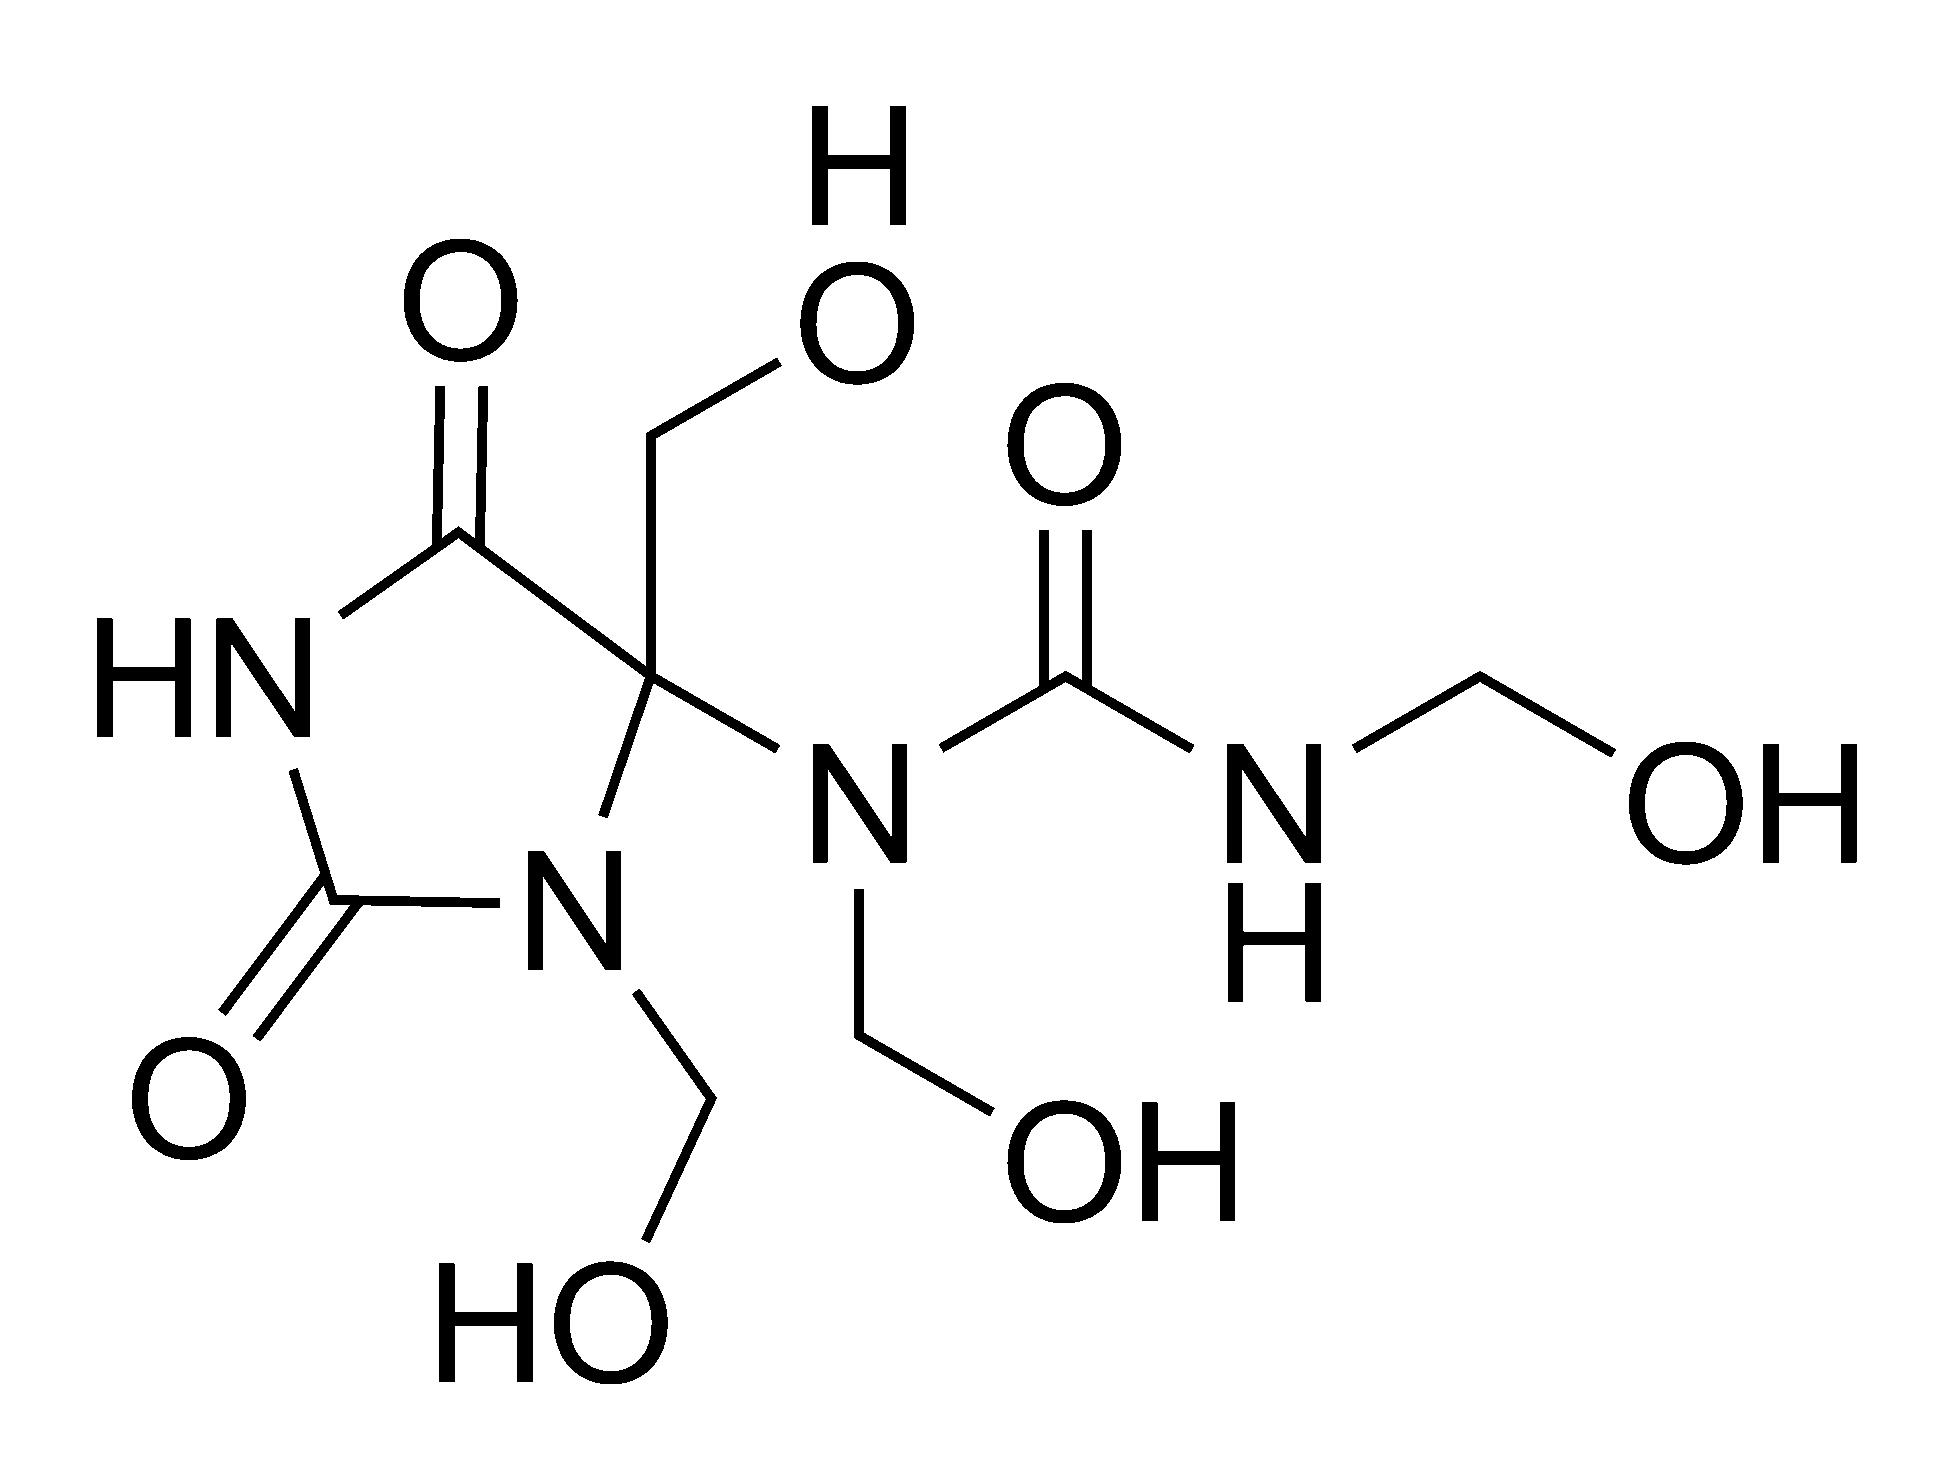 Diazolidinyl Urea Correct Formula